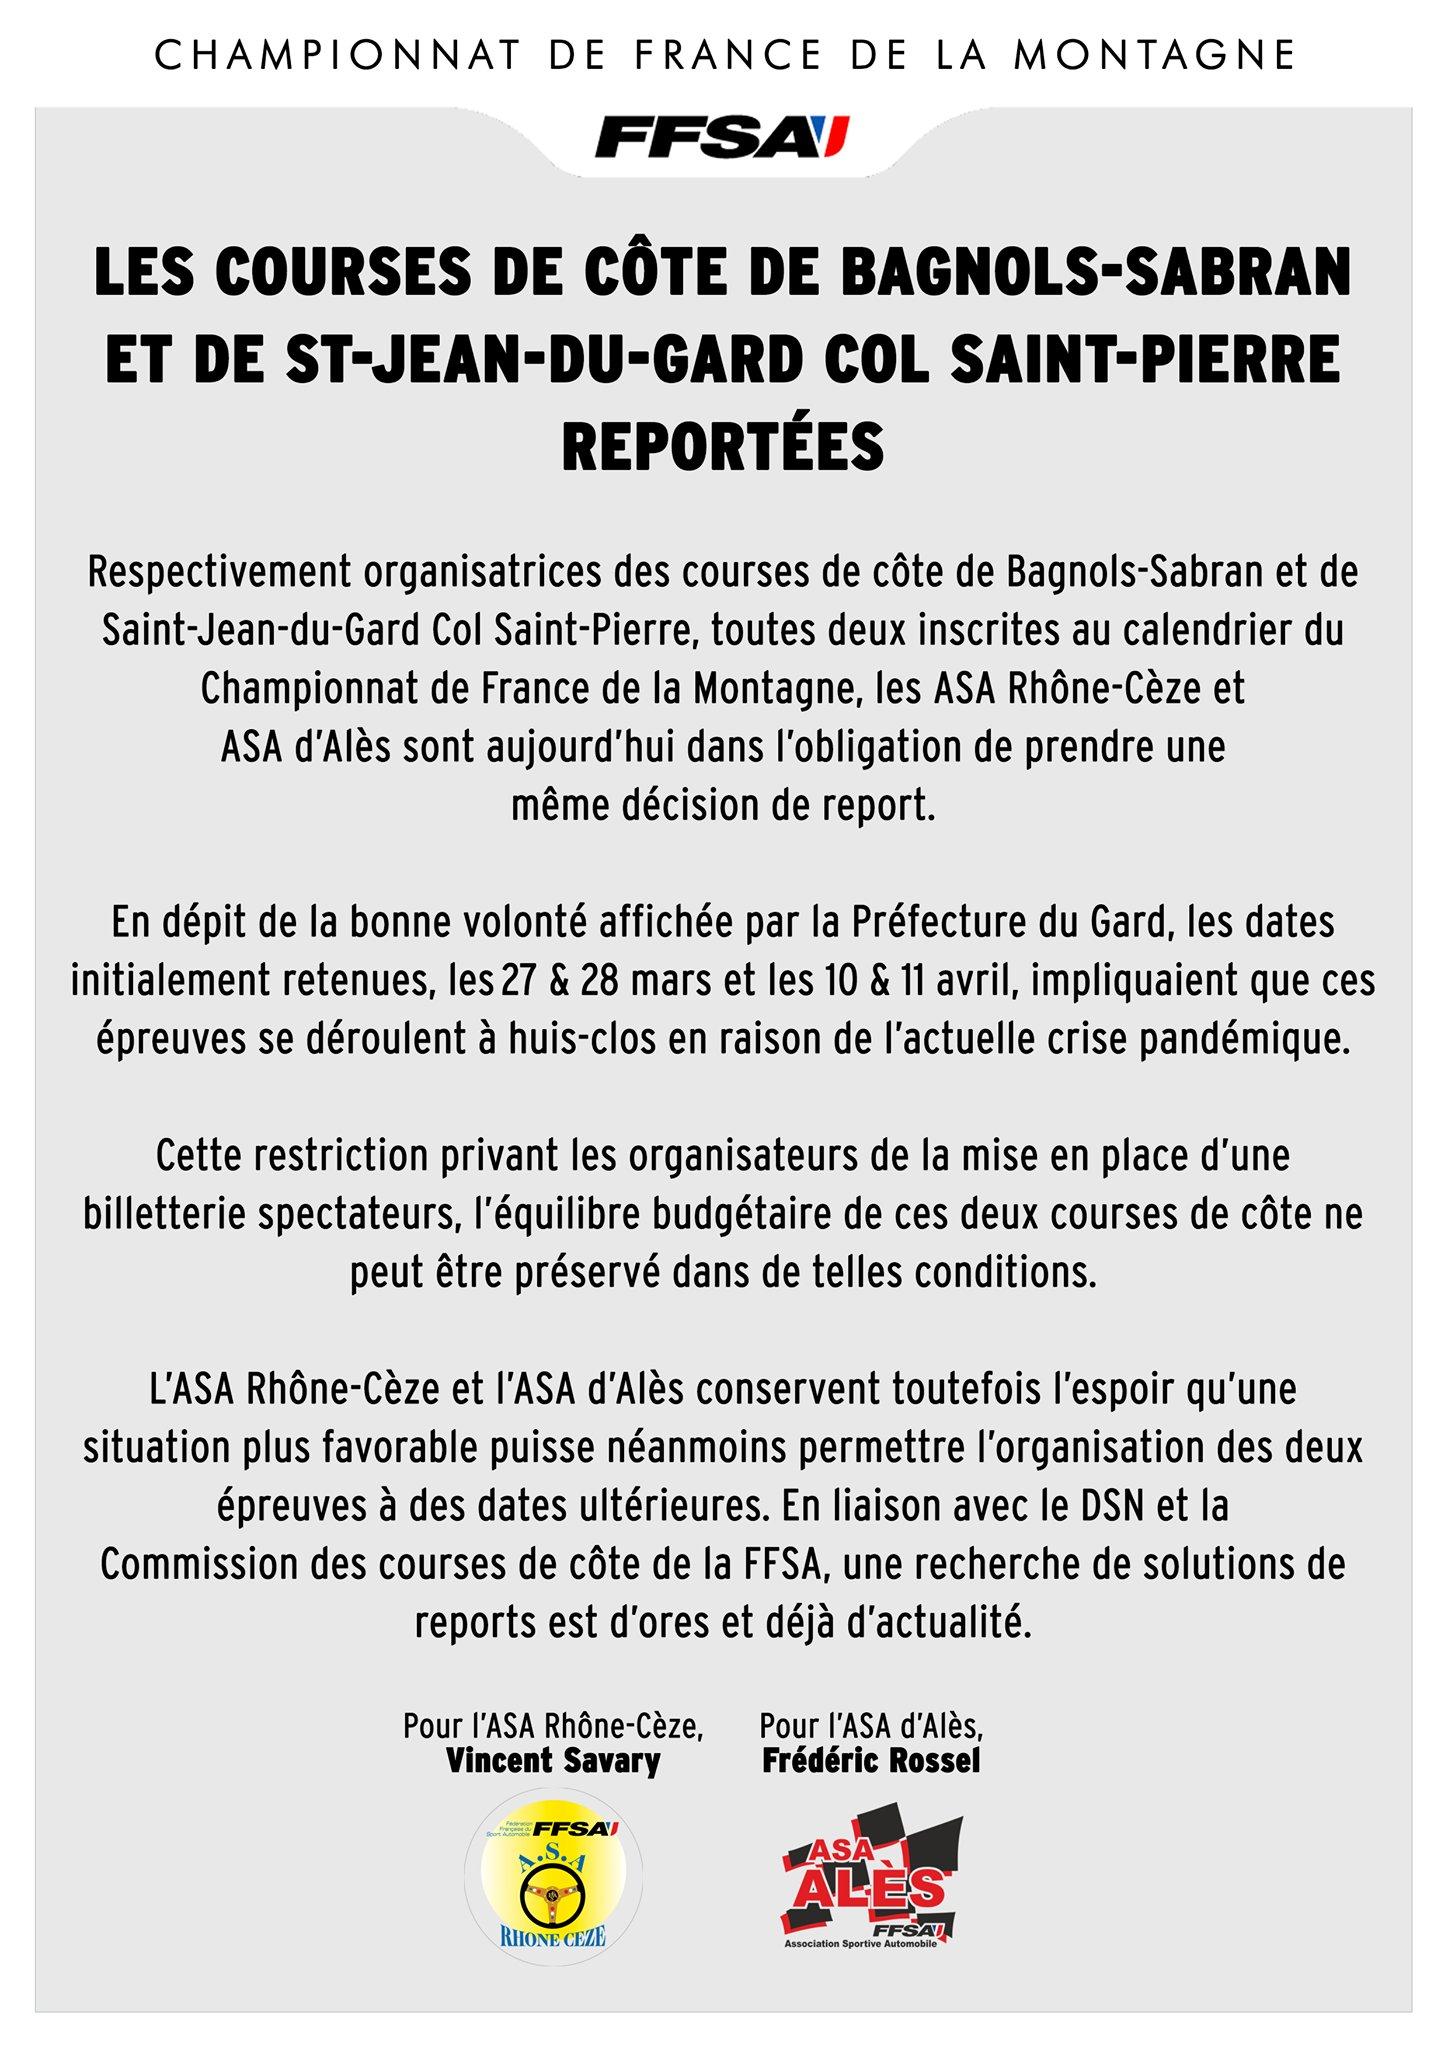 Campeonatos de Montaña Nacionales e Internacionales (FIA European Hillclimb, Berg Cup, BHC, CIVM, CFM...) - Página 40 EurwMmWXUAM_v_r?format=jpg&name=large